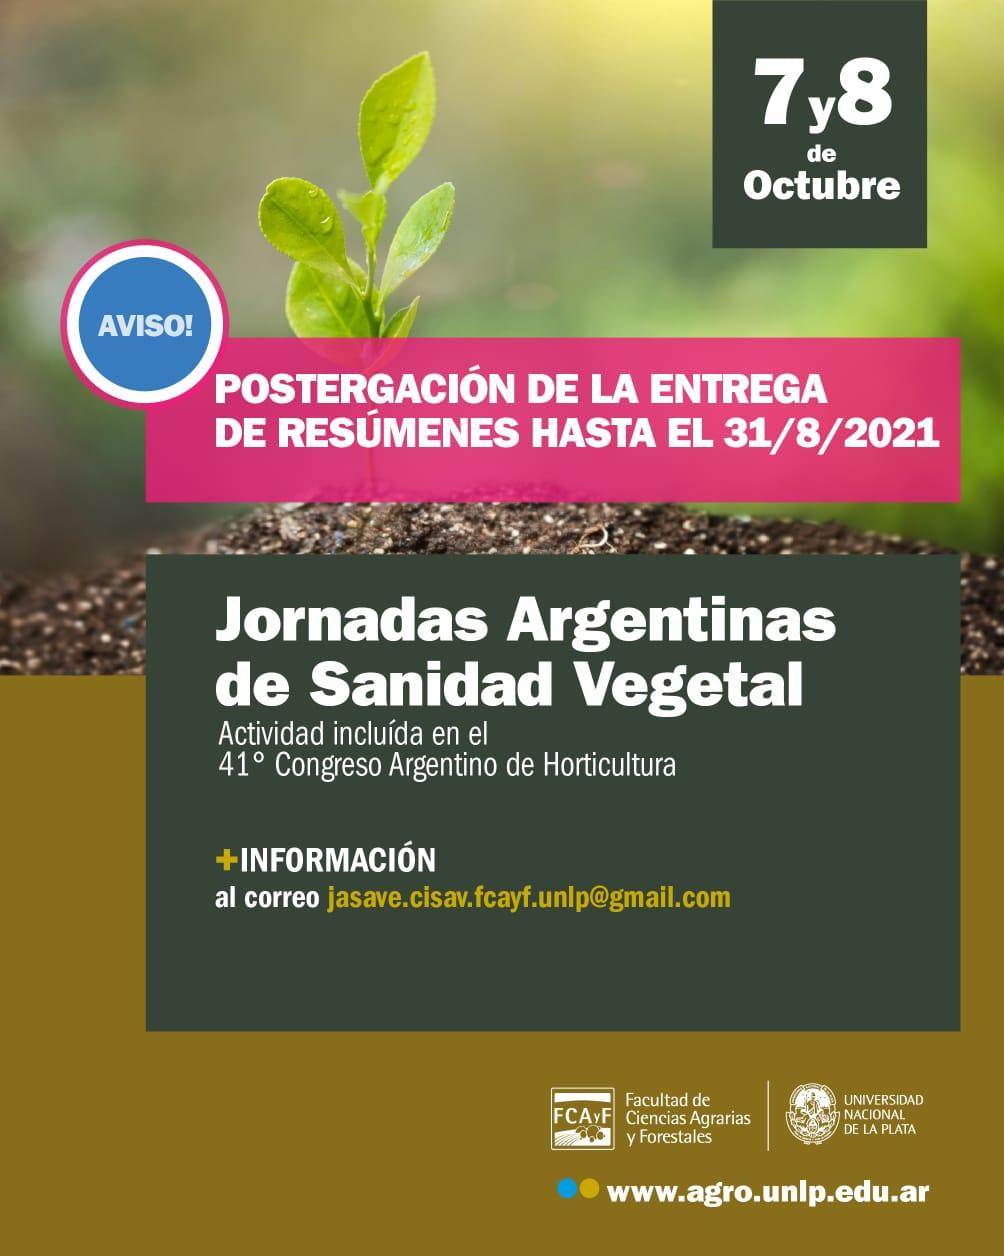 Jornadas Argentinas de Sanidad Vegetal